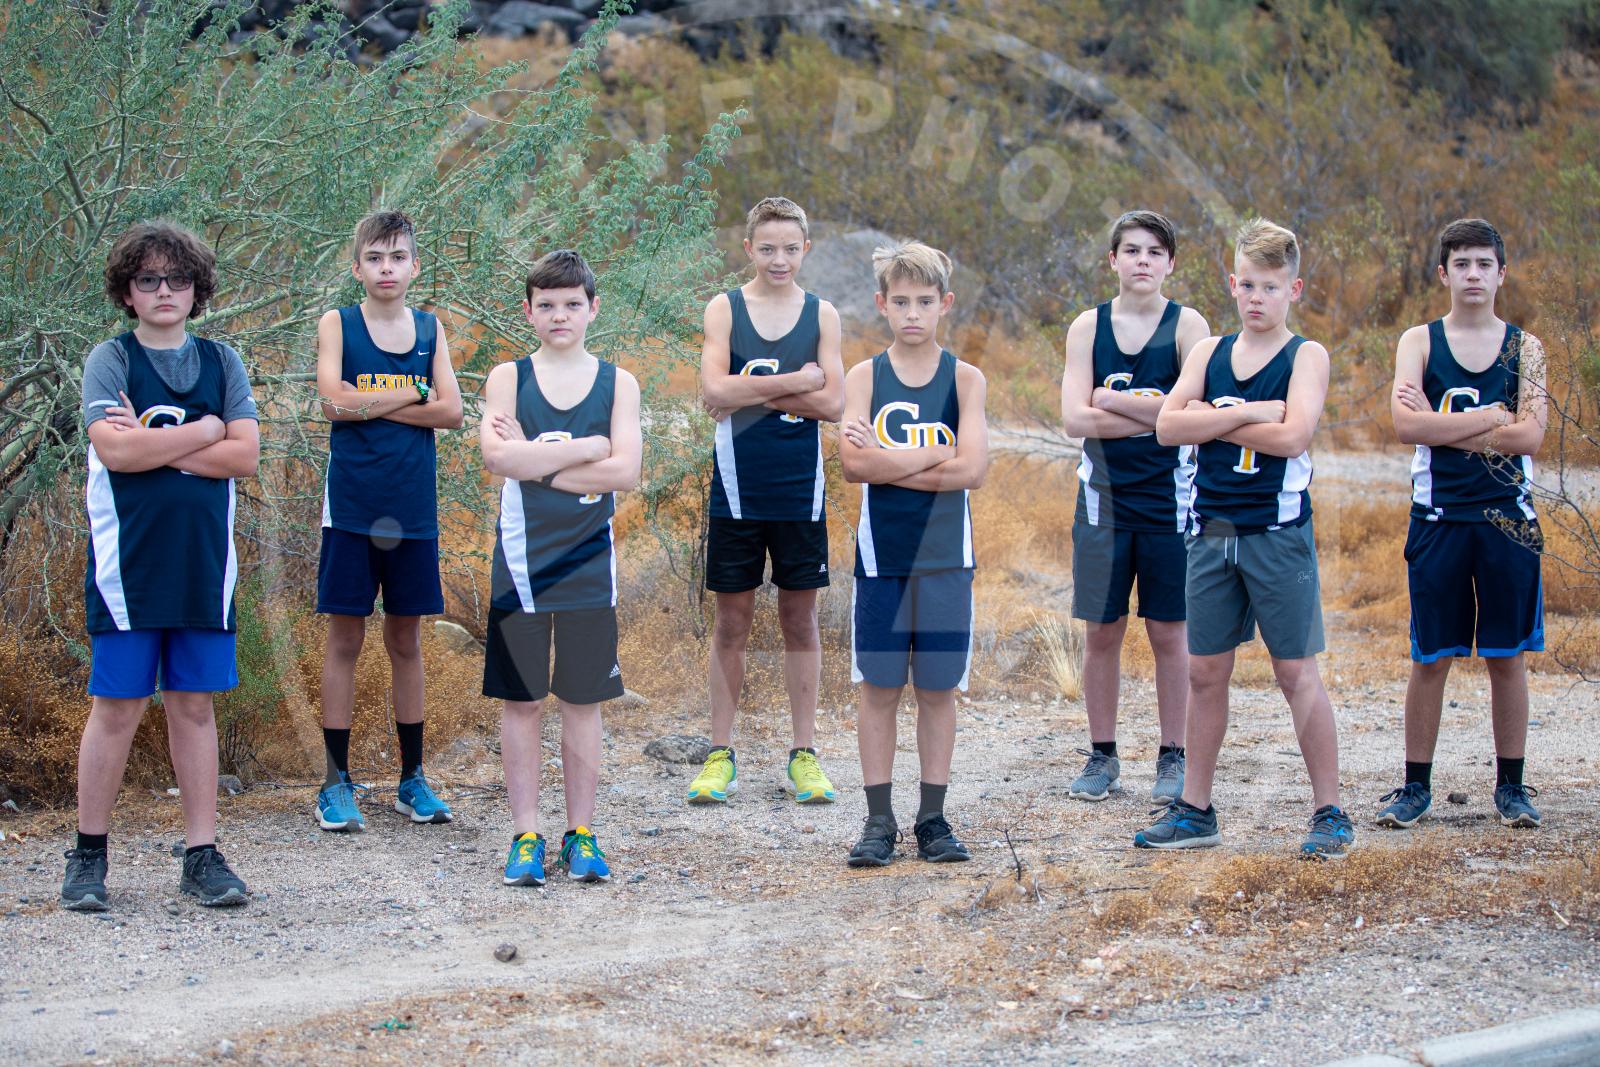 boy cross country team pic